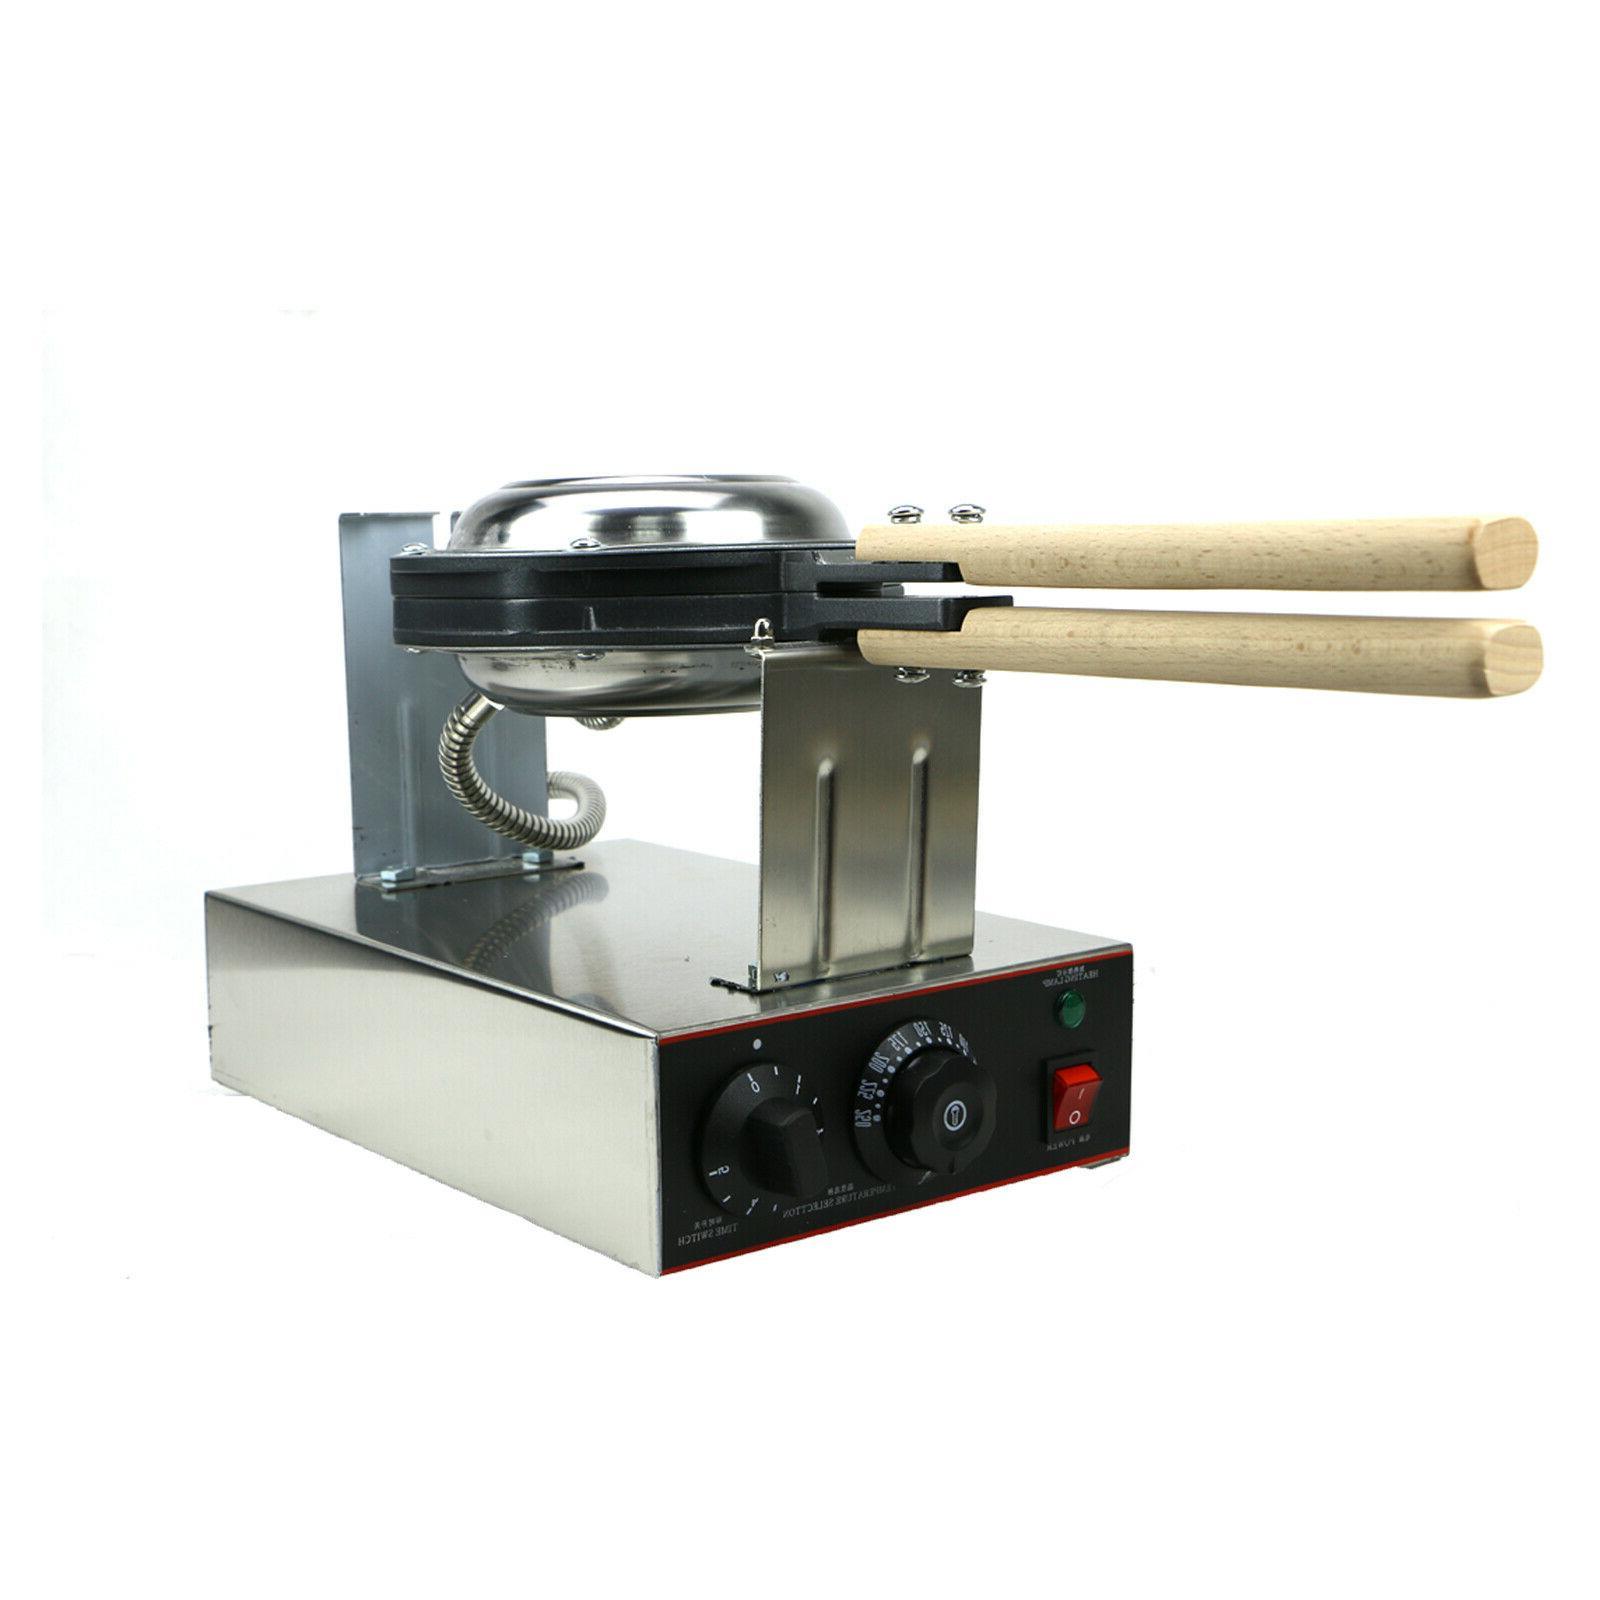 NEW Electric Cake Stick Baker Machine USA